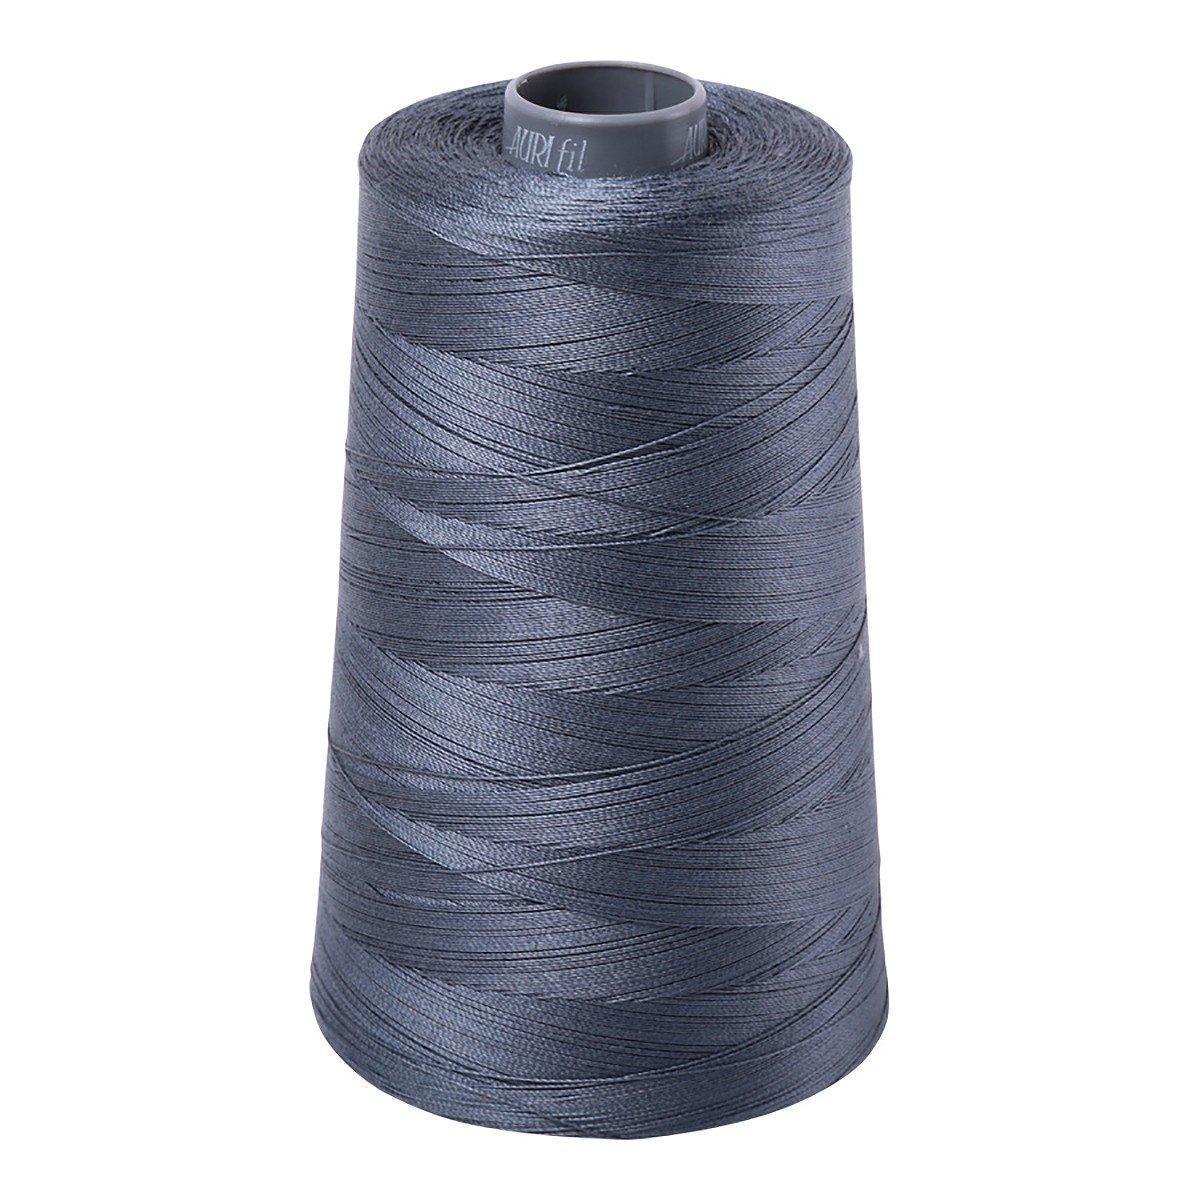 Mako (Cotton) Embroidery Thread 28wt 3609yds Dark Grey